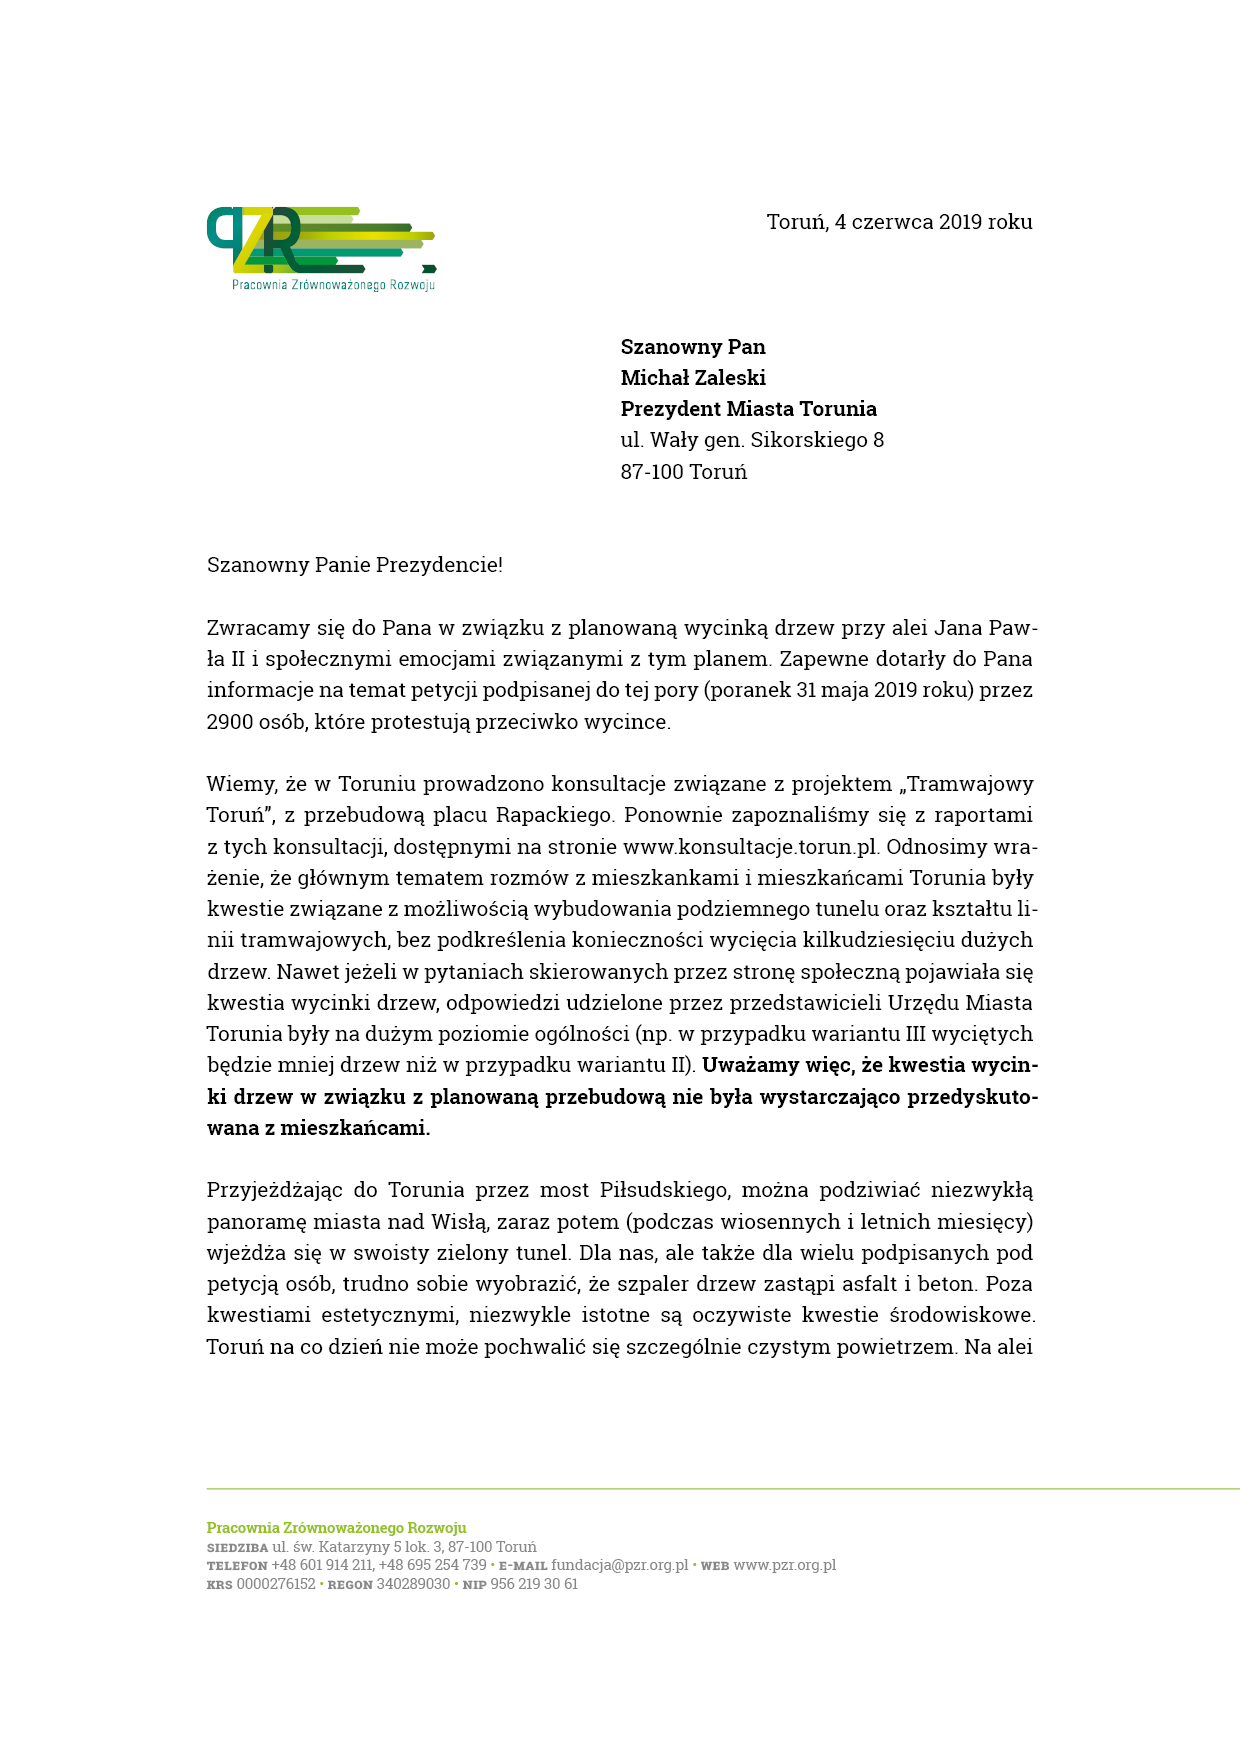 List do Prezydenta Miasta Torunia